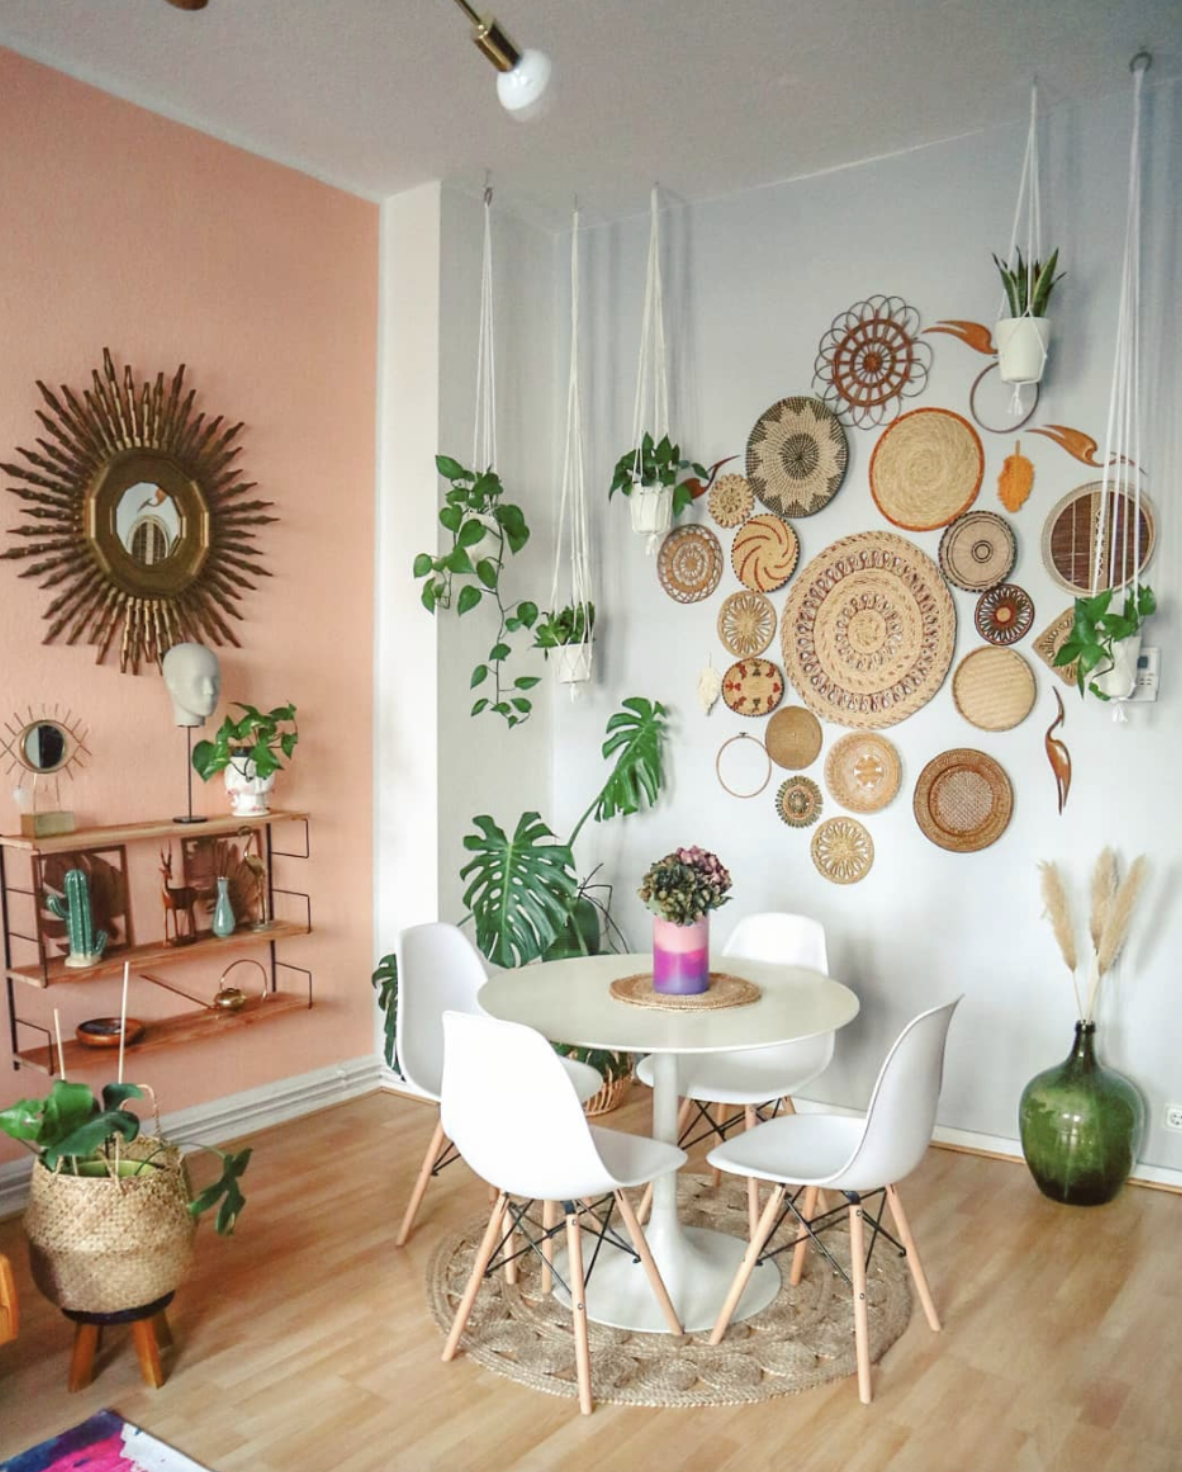 Affordable Home Decor - Basket Wall